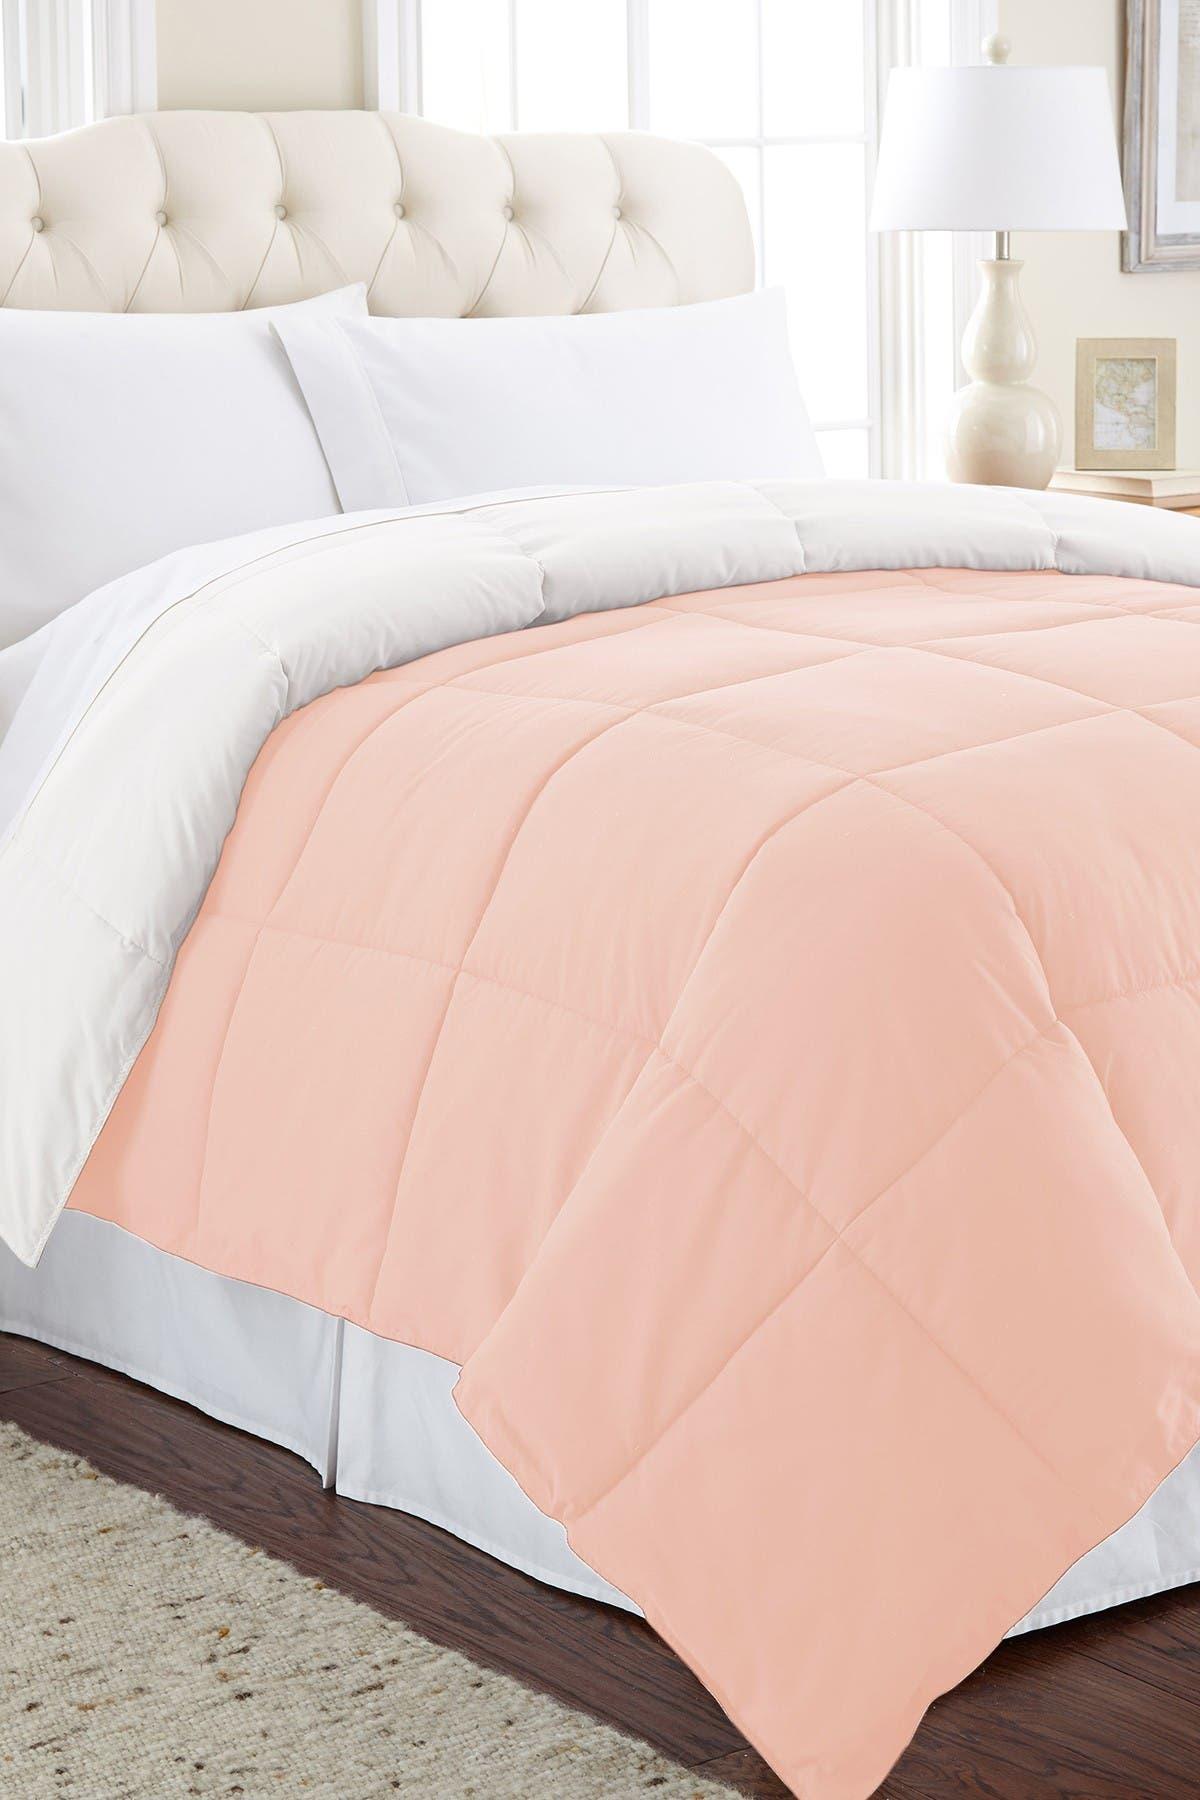 Image of Modern Threads Down Alternative Reversible King Comforter - Blush/White